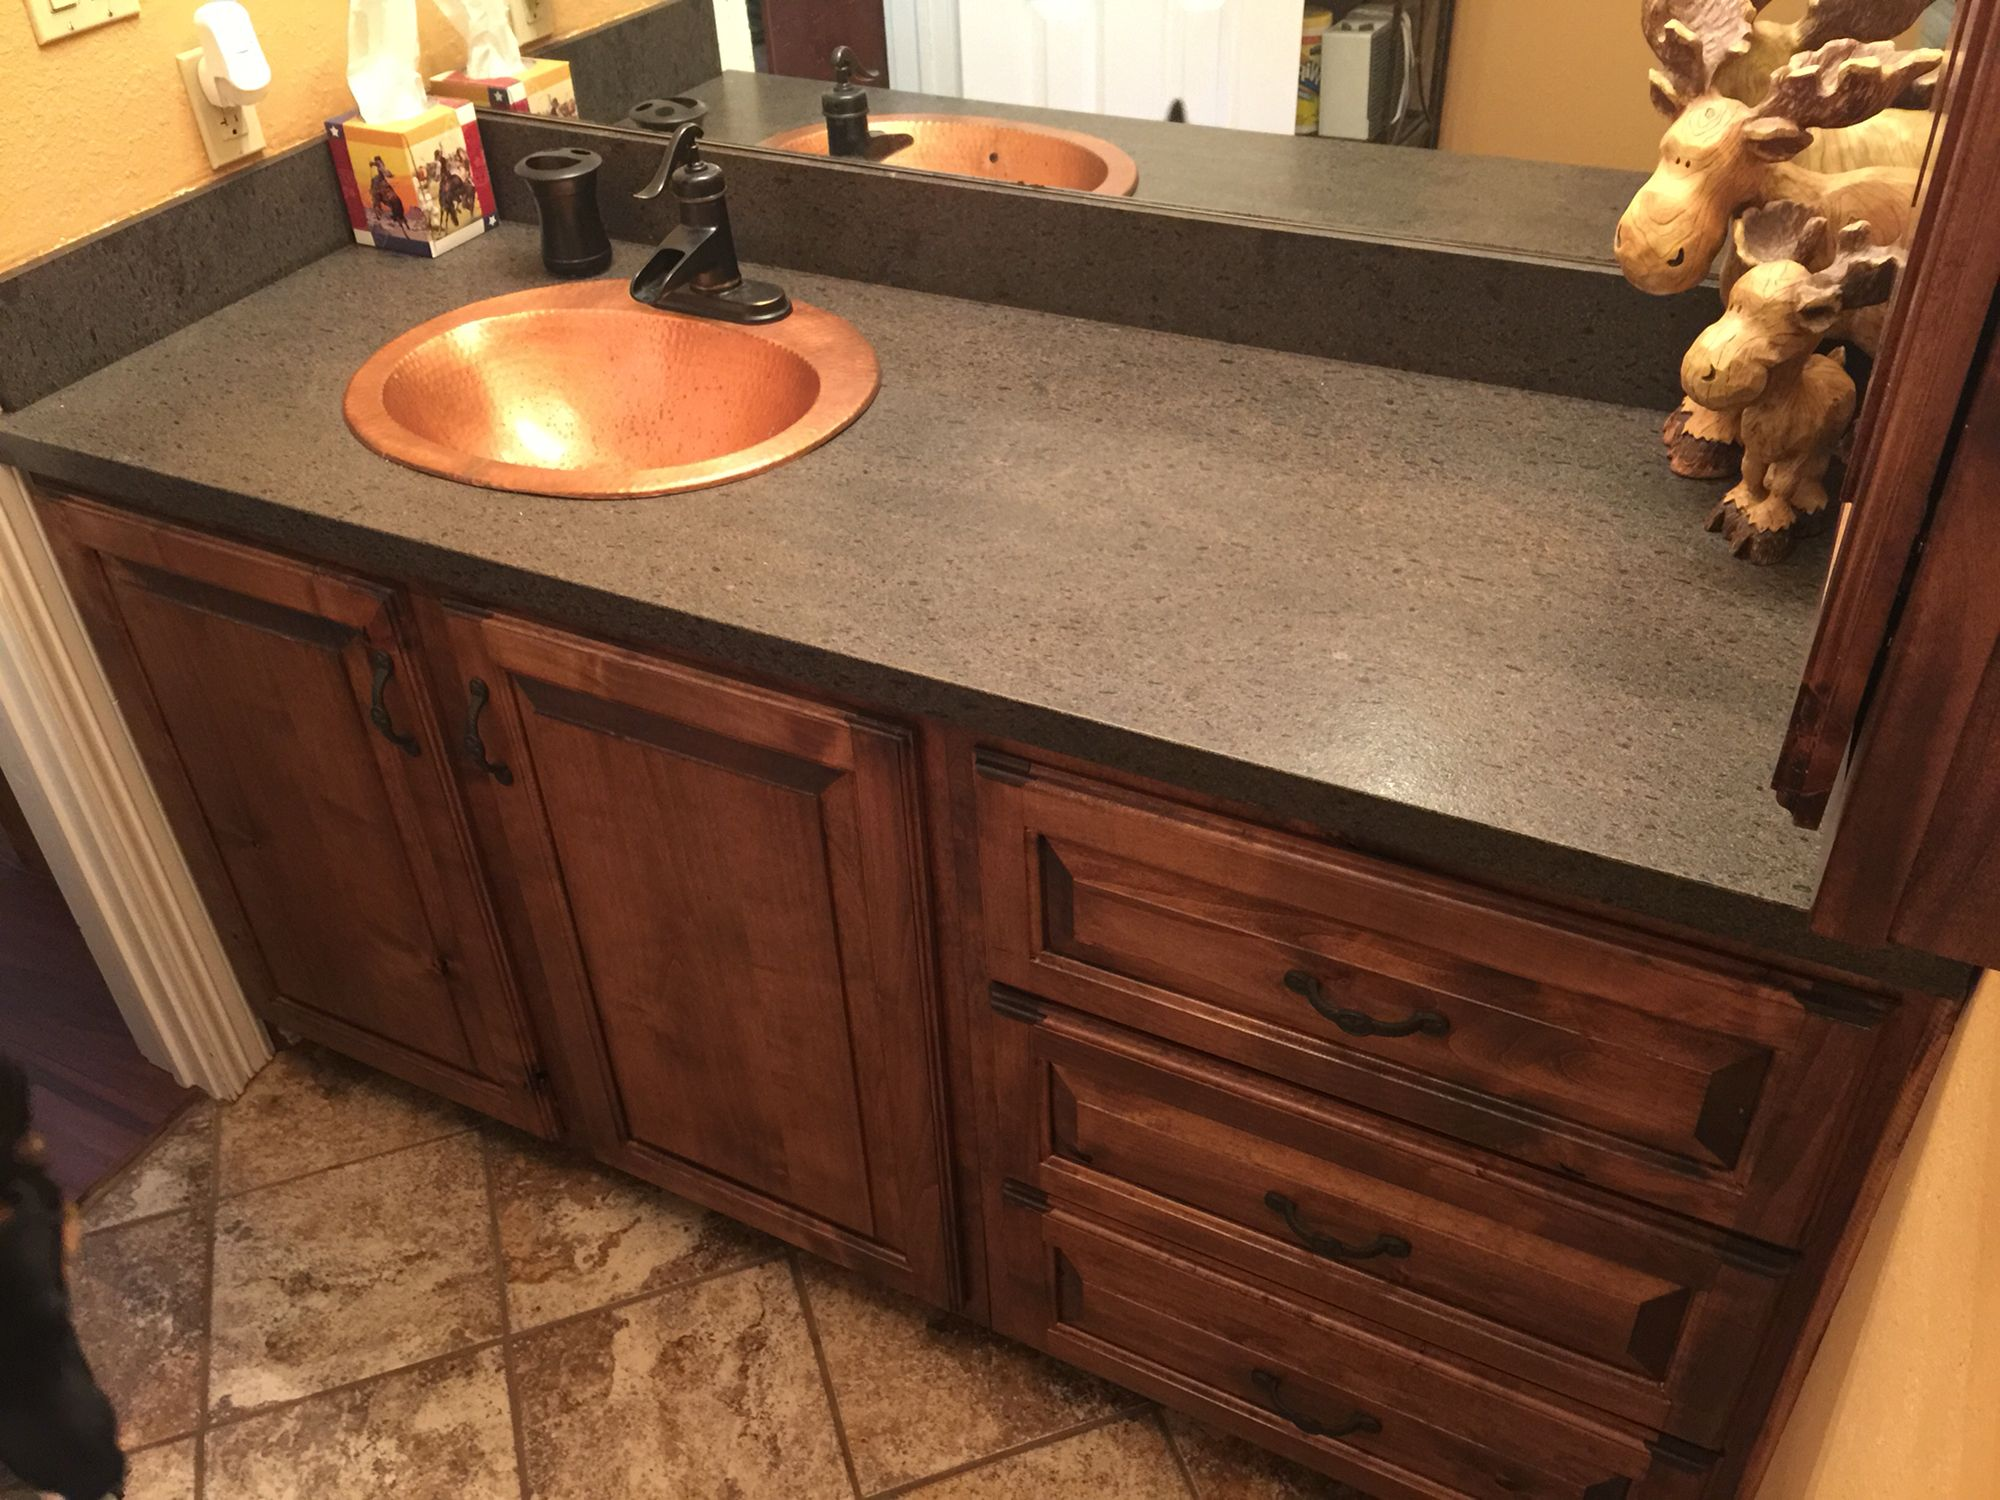 Custom Bathroom Vanity Wood Knotty Alder Stain Early American